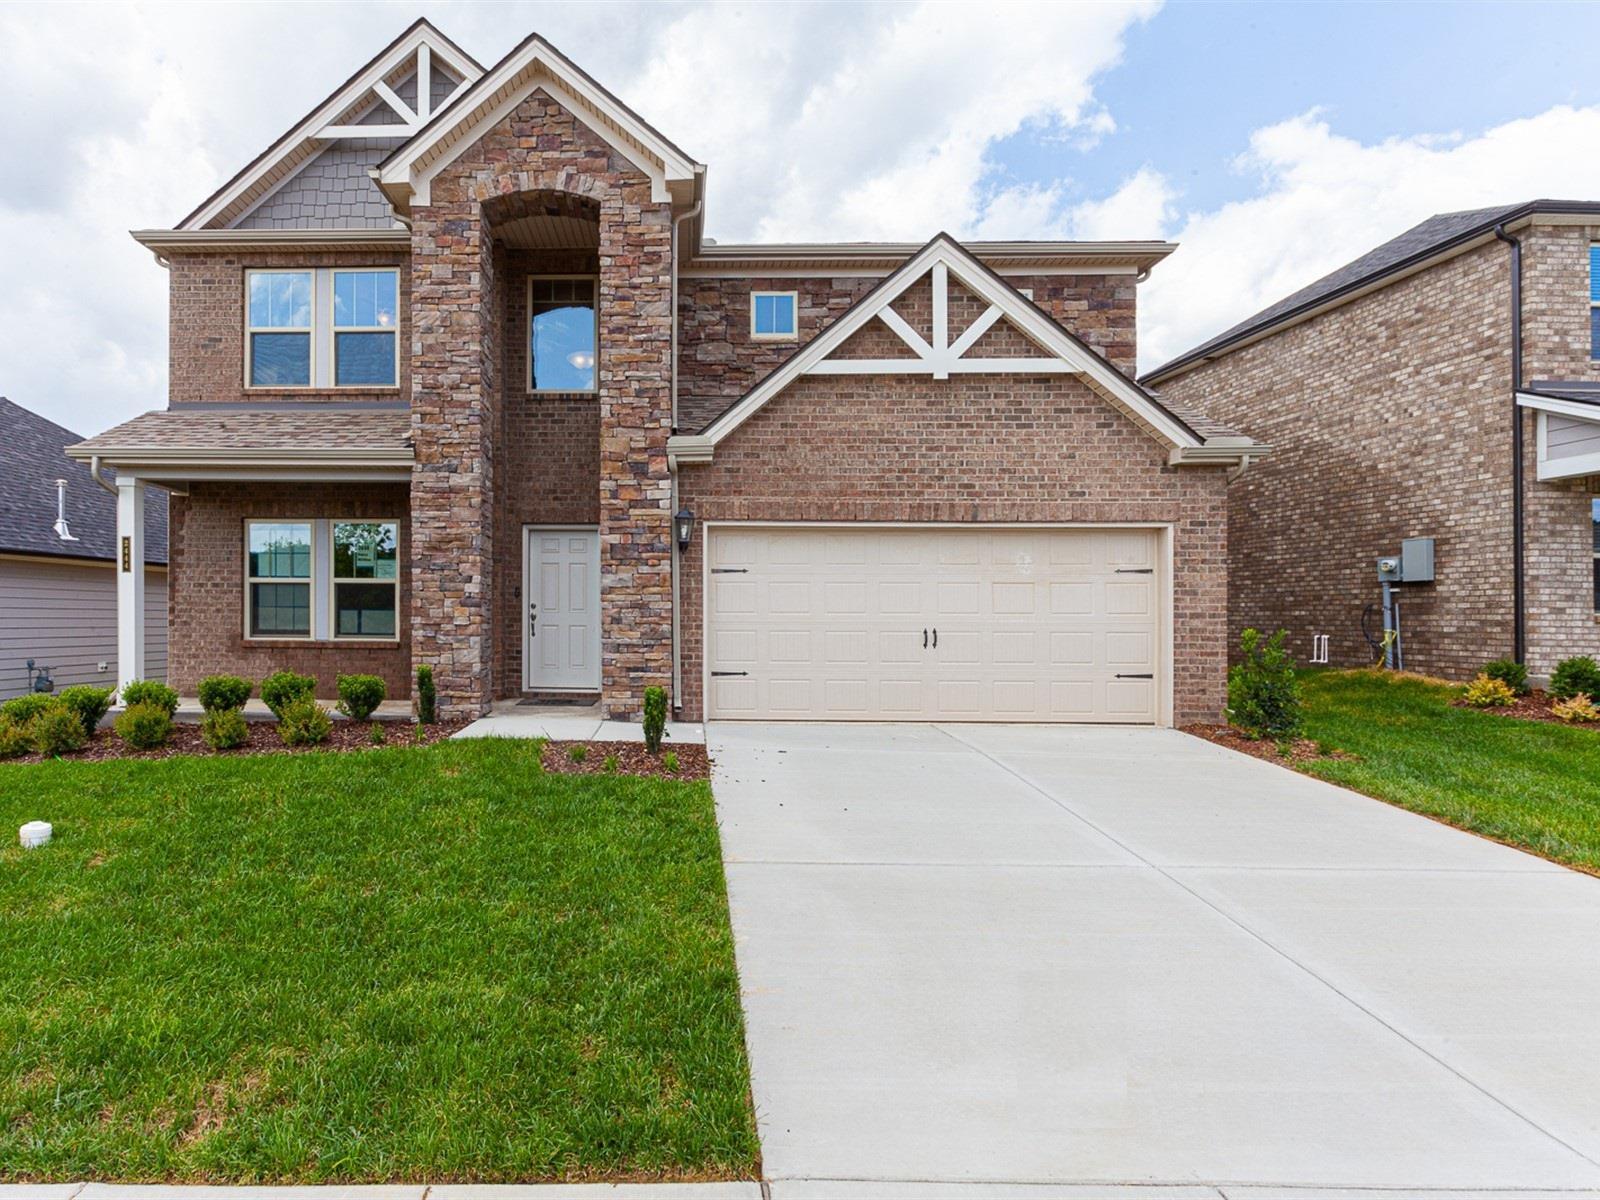 2444 Prairie Hill Drive #42, Antioch, TN 37013 - Antioch, TN real estate listing